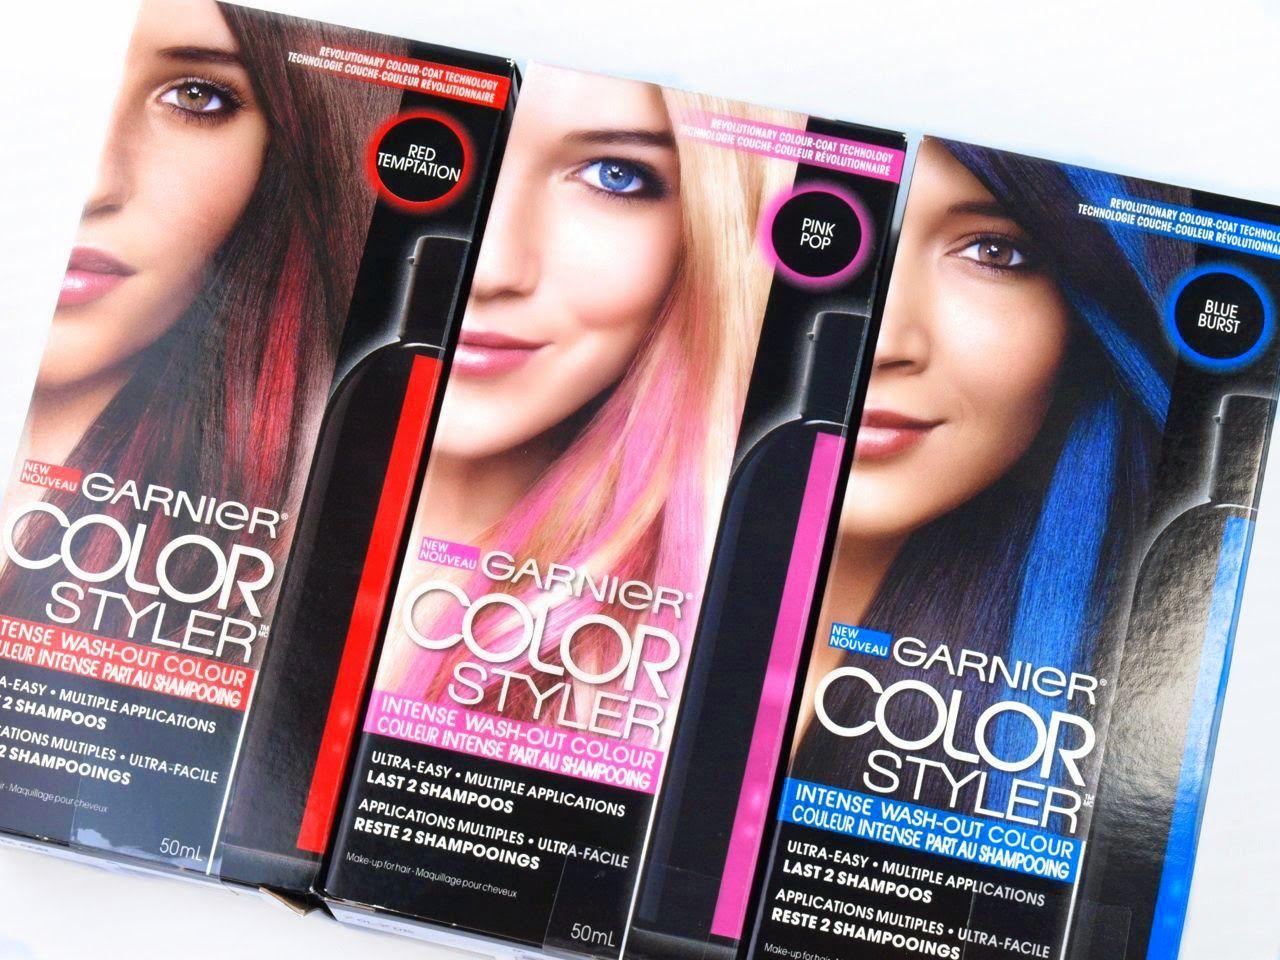 Garnier Color Styler Intense Wash Out Color Review Wash Out Hair Color Temporary Hair Color Hair Color Reviews